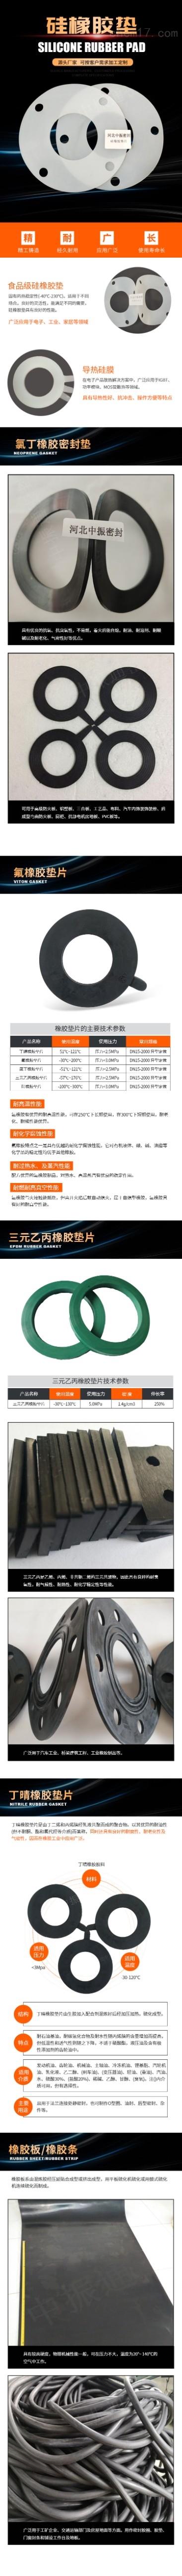 zztmfcl-详情页5-硅橡胶垫.jpg